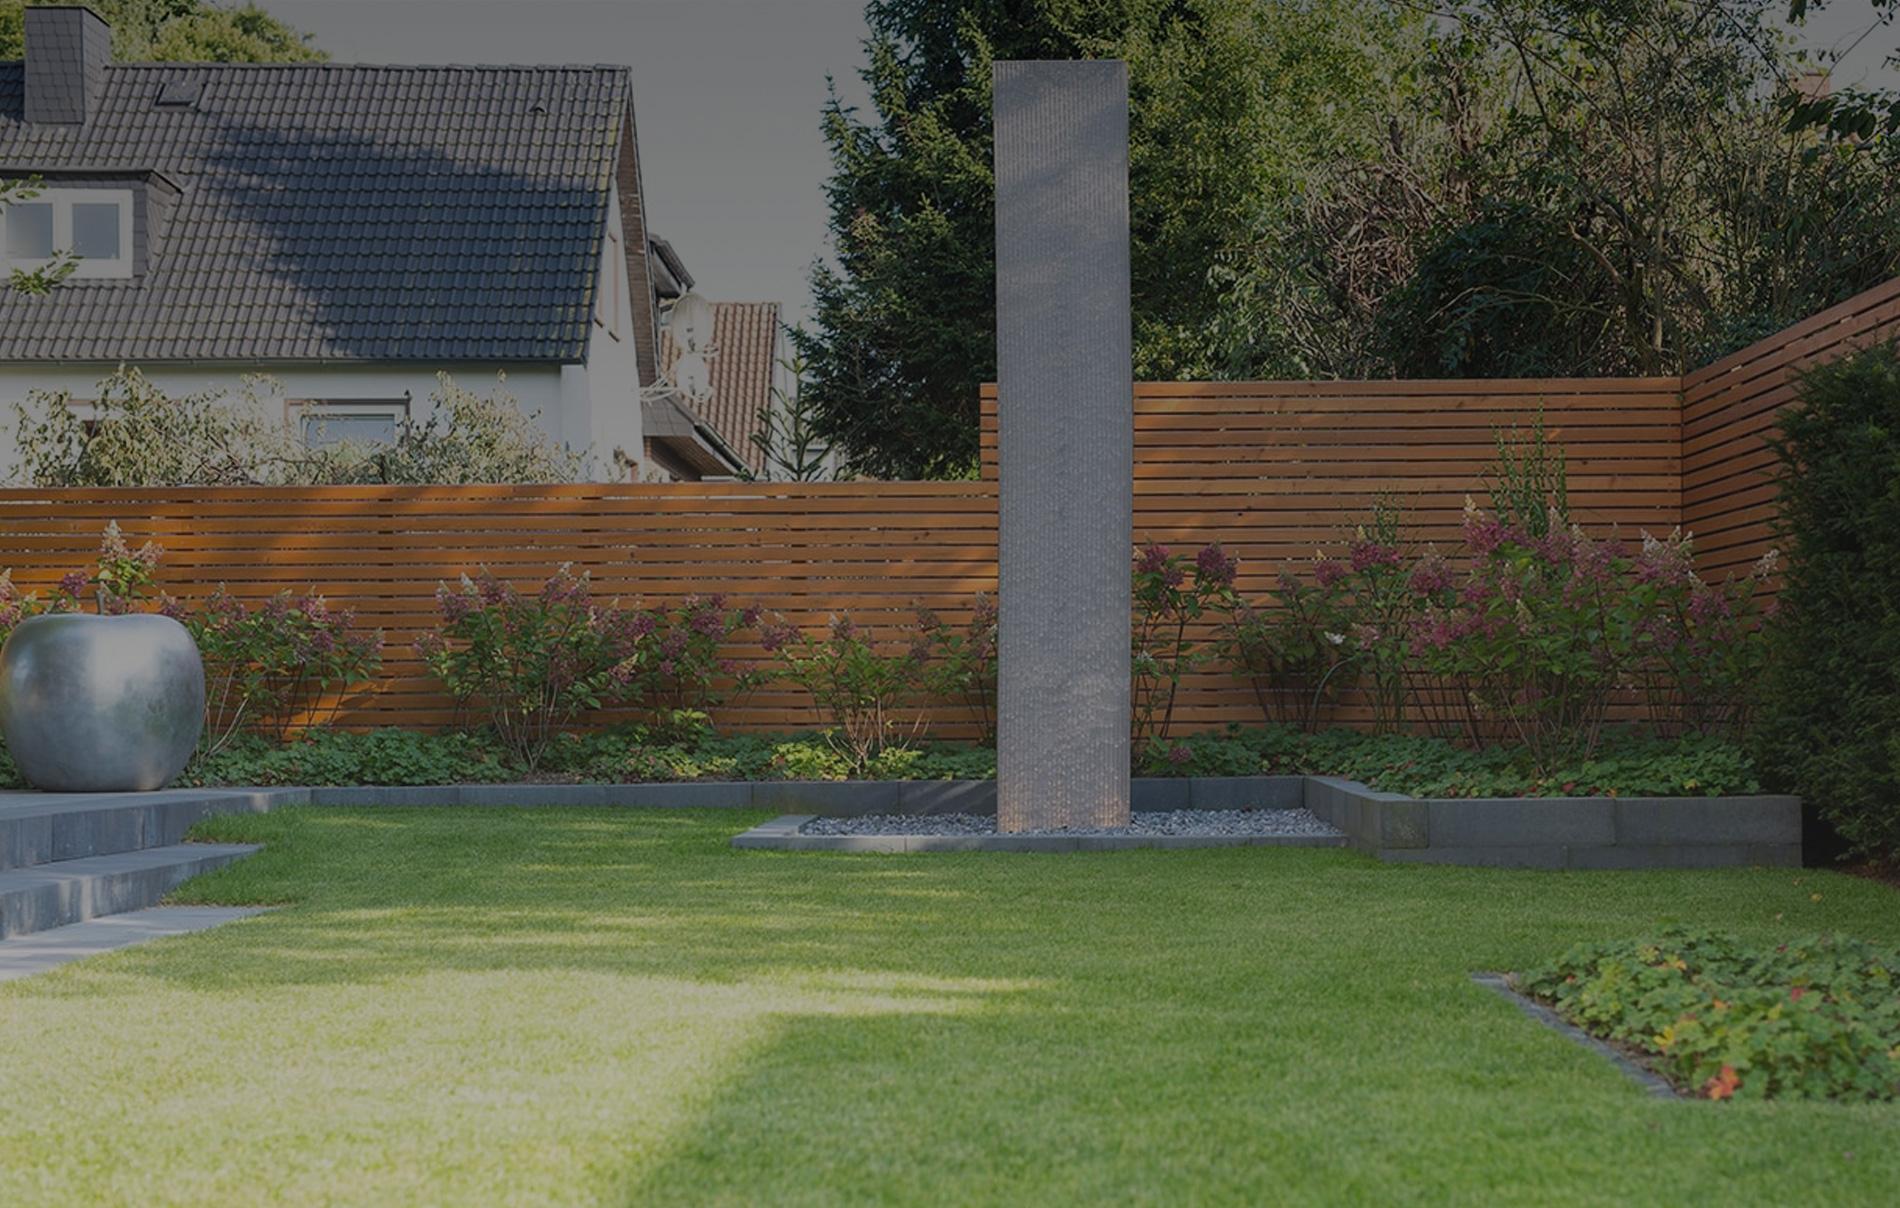 3raumGärtner Garten und Landschaftsbau Osnabrück